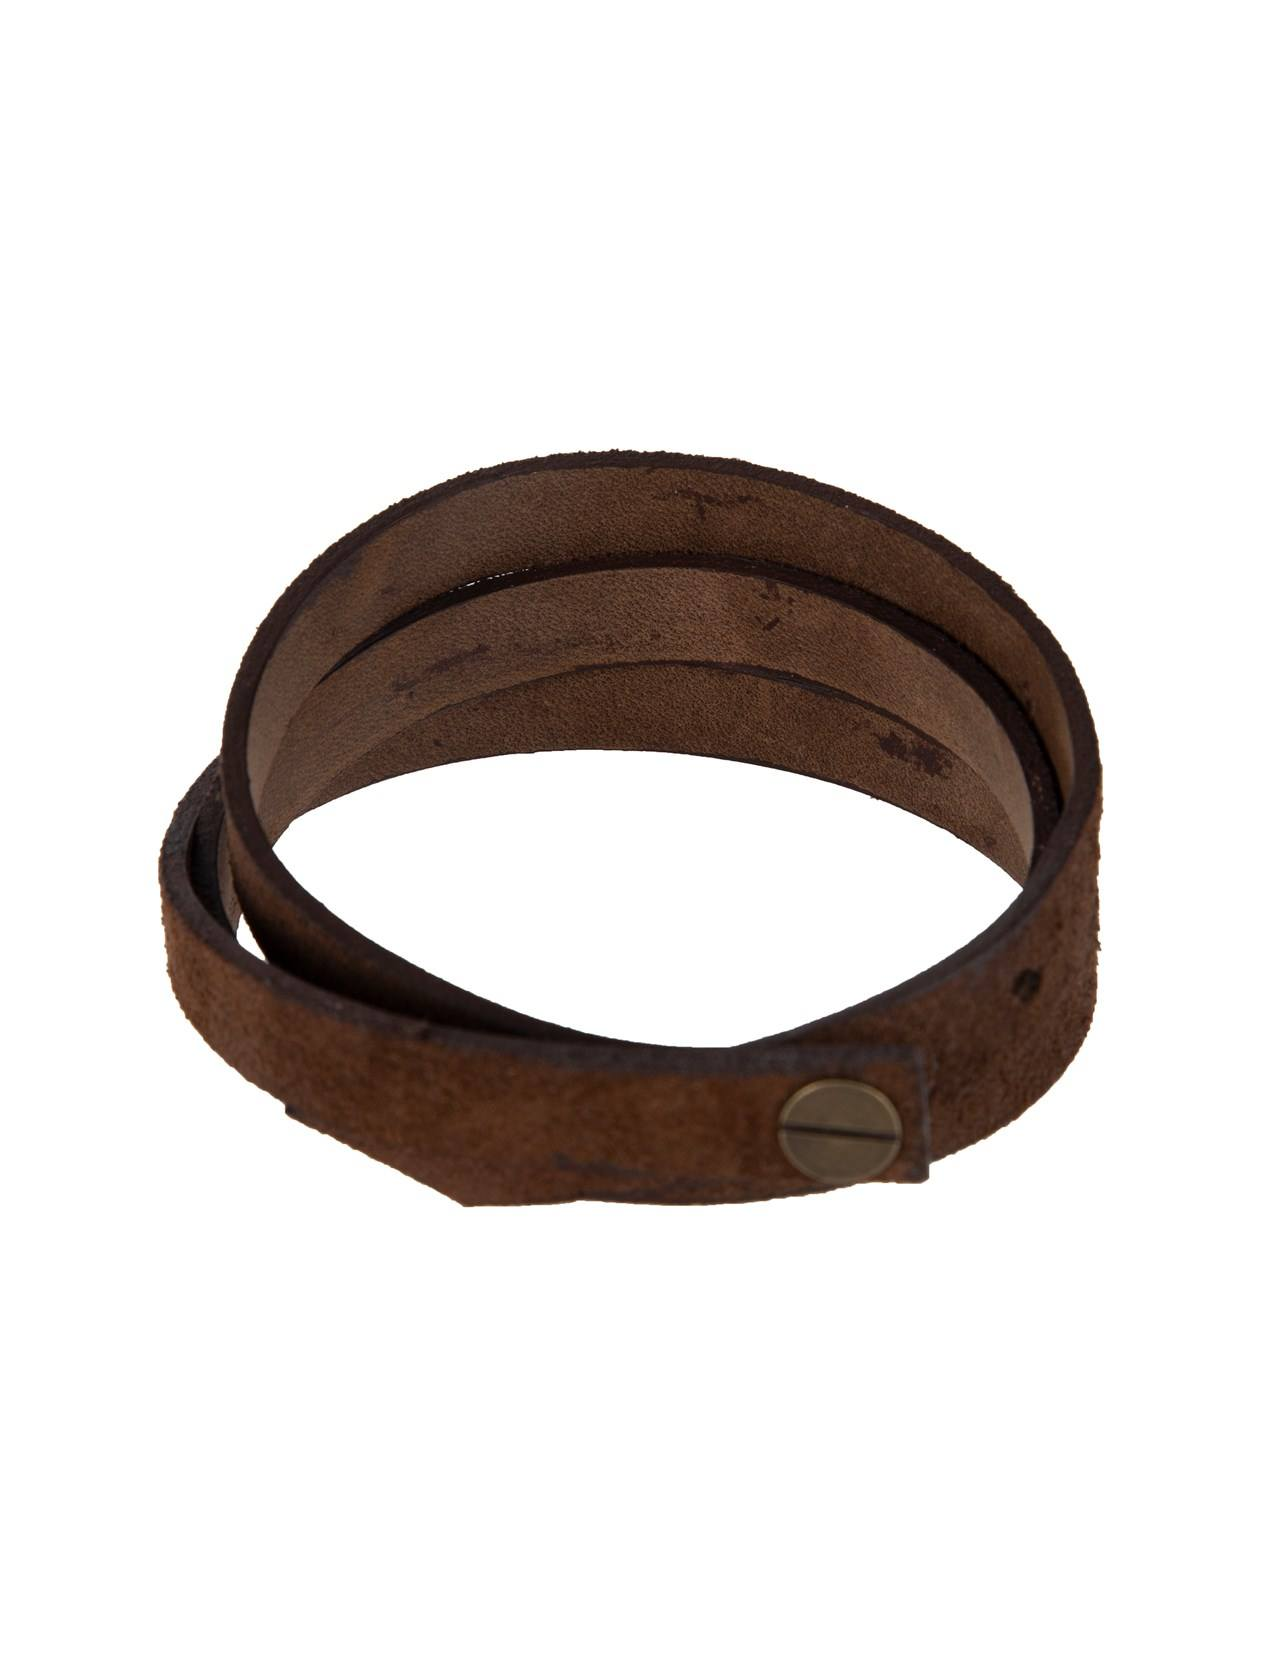 دستبند چرم بزرگسال - چرم لانکا تک سایز - قهوه اي - 2